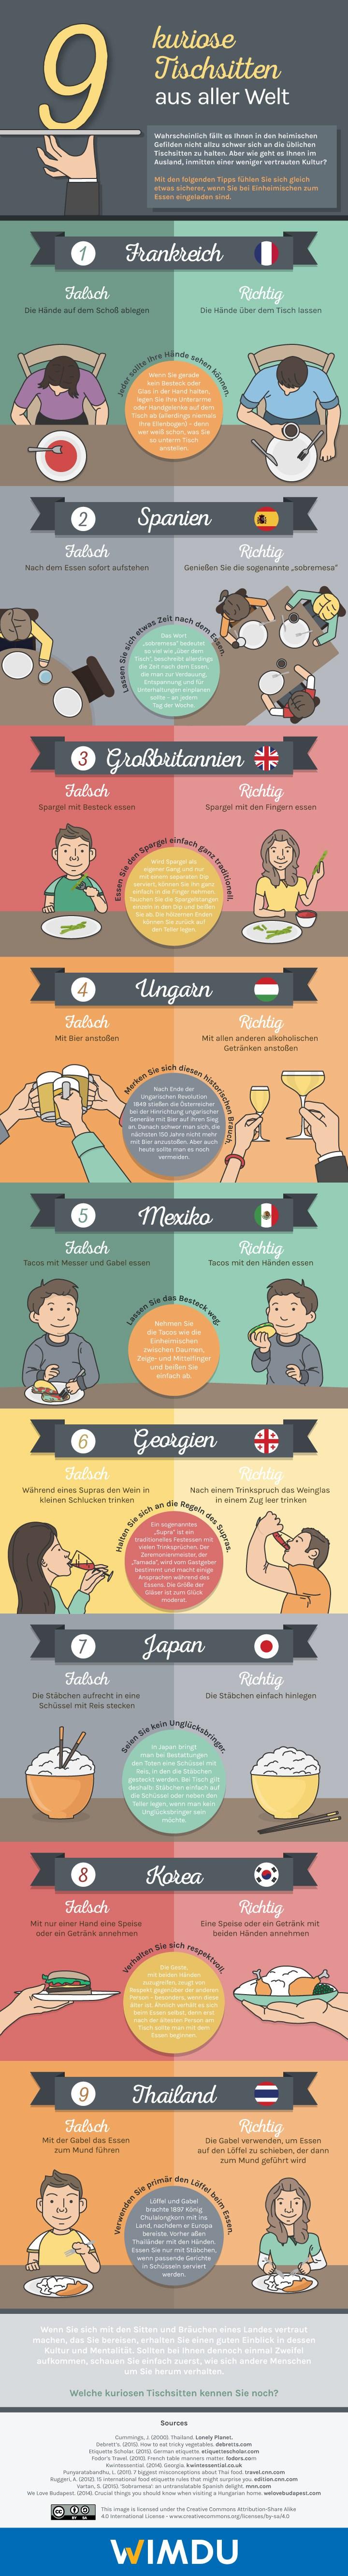 9-kuriose-Tischsitten-aus-aller-Welt-Infografik